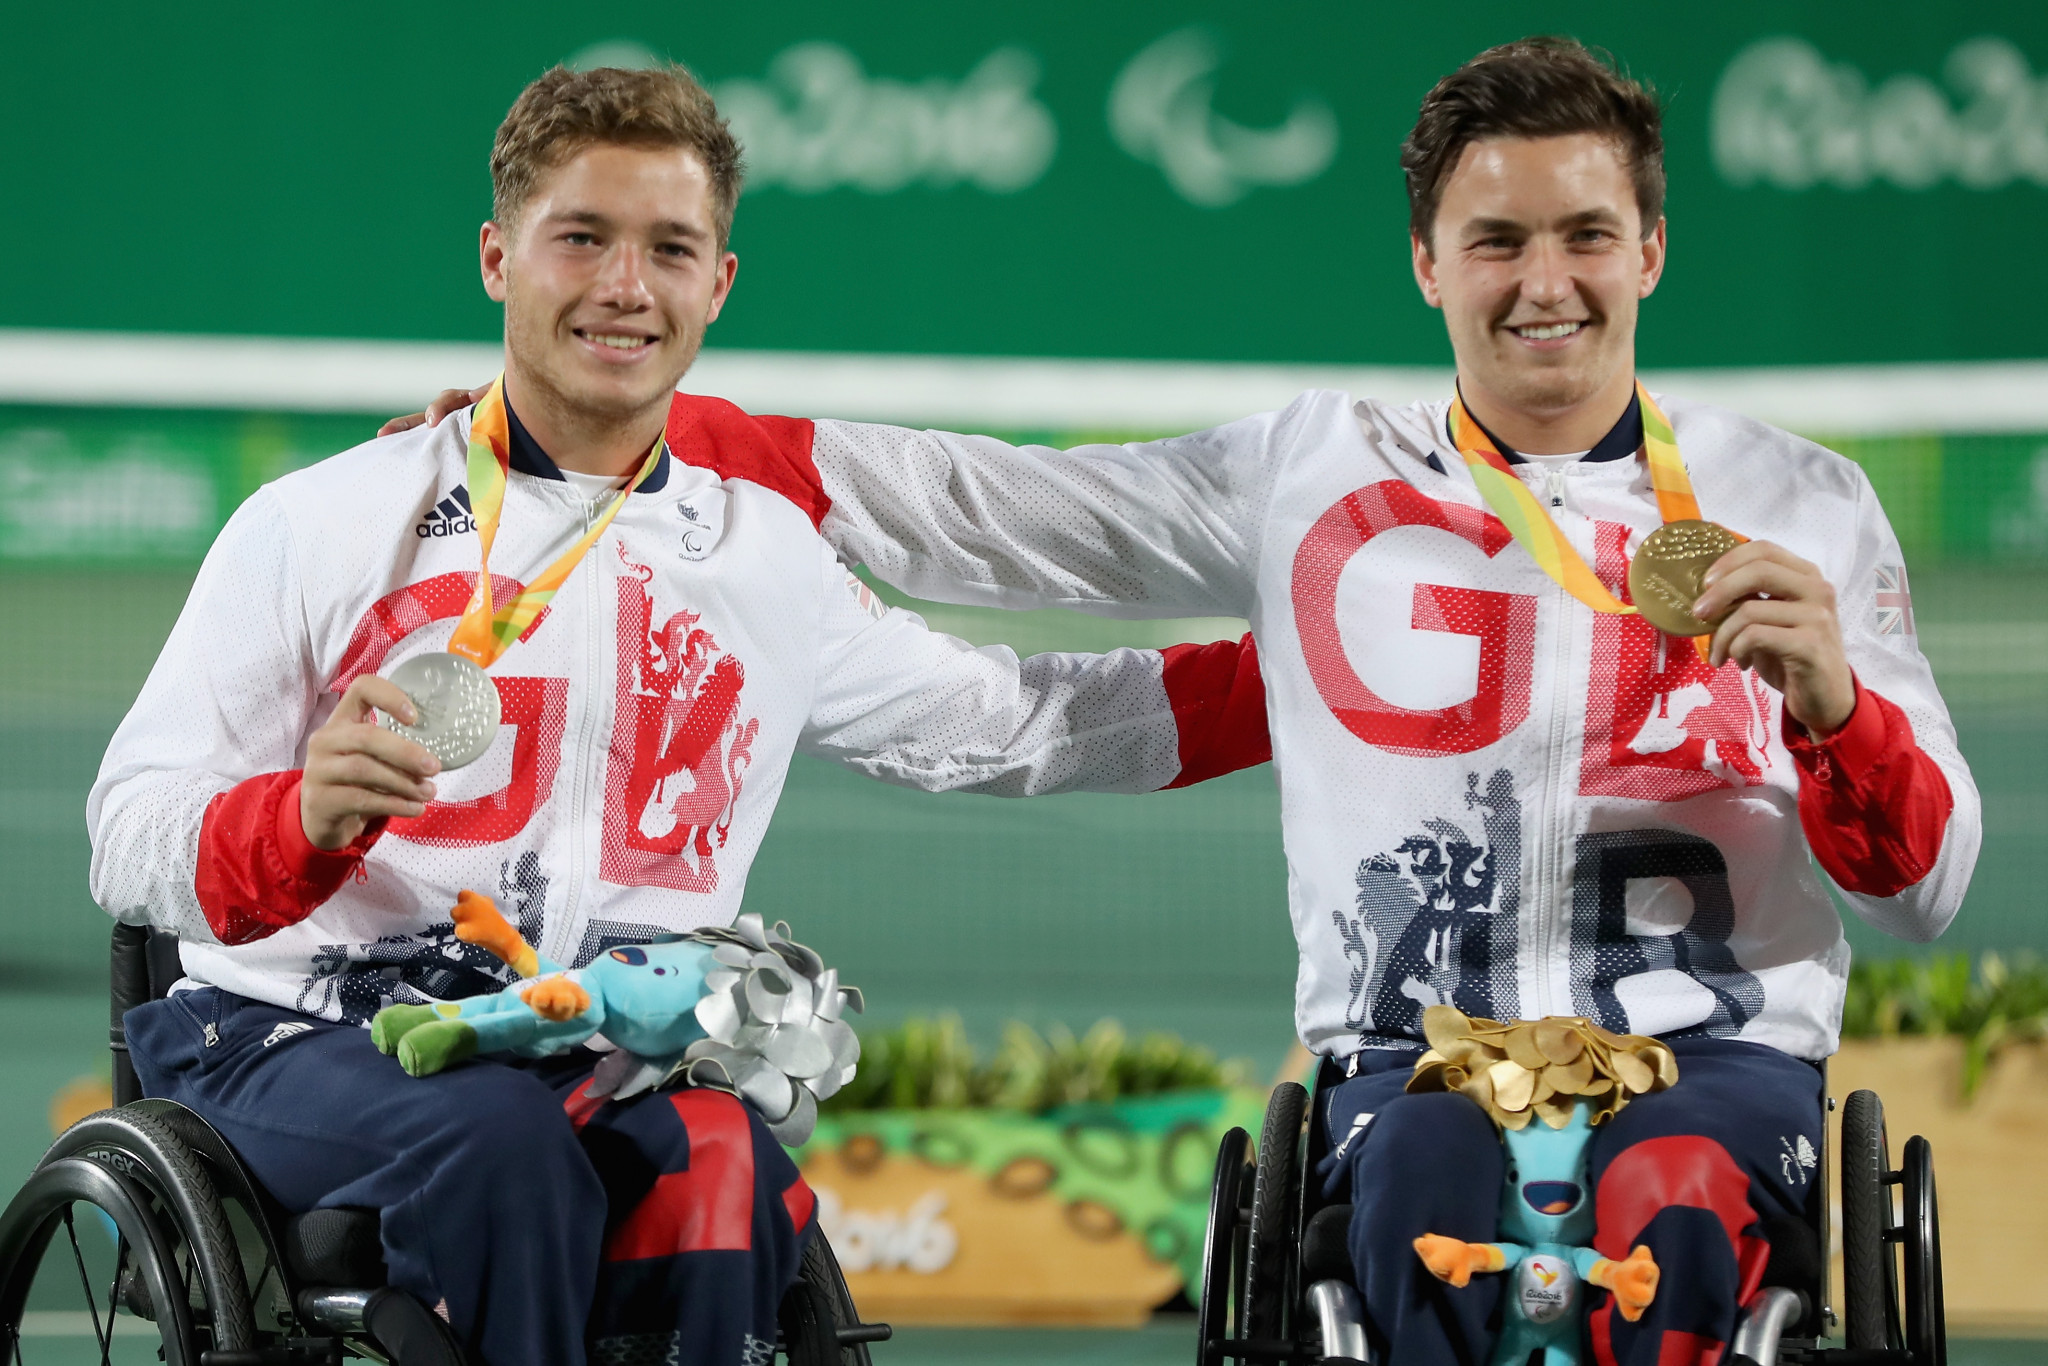 Gordon Reid, right, beat Alfie Hewett to win men's singles gold at Rio 2016 ©Getty Images